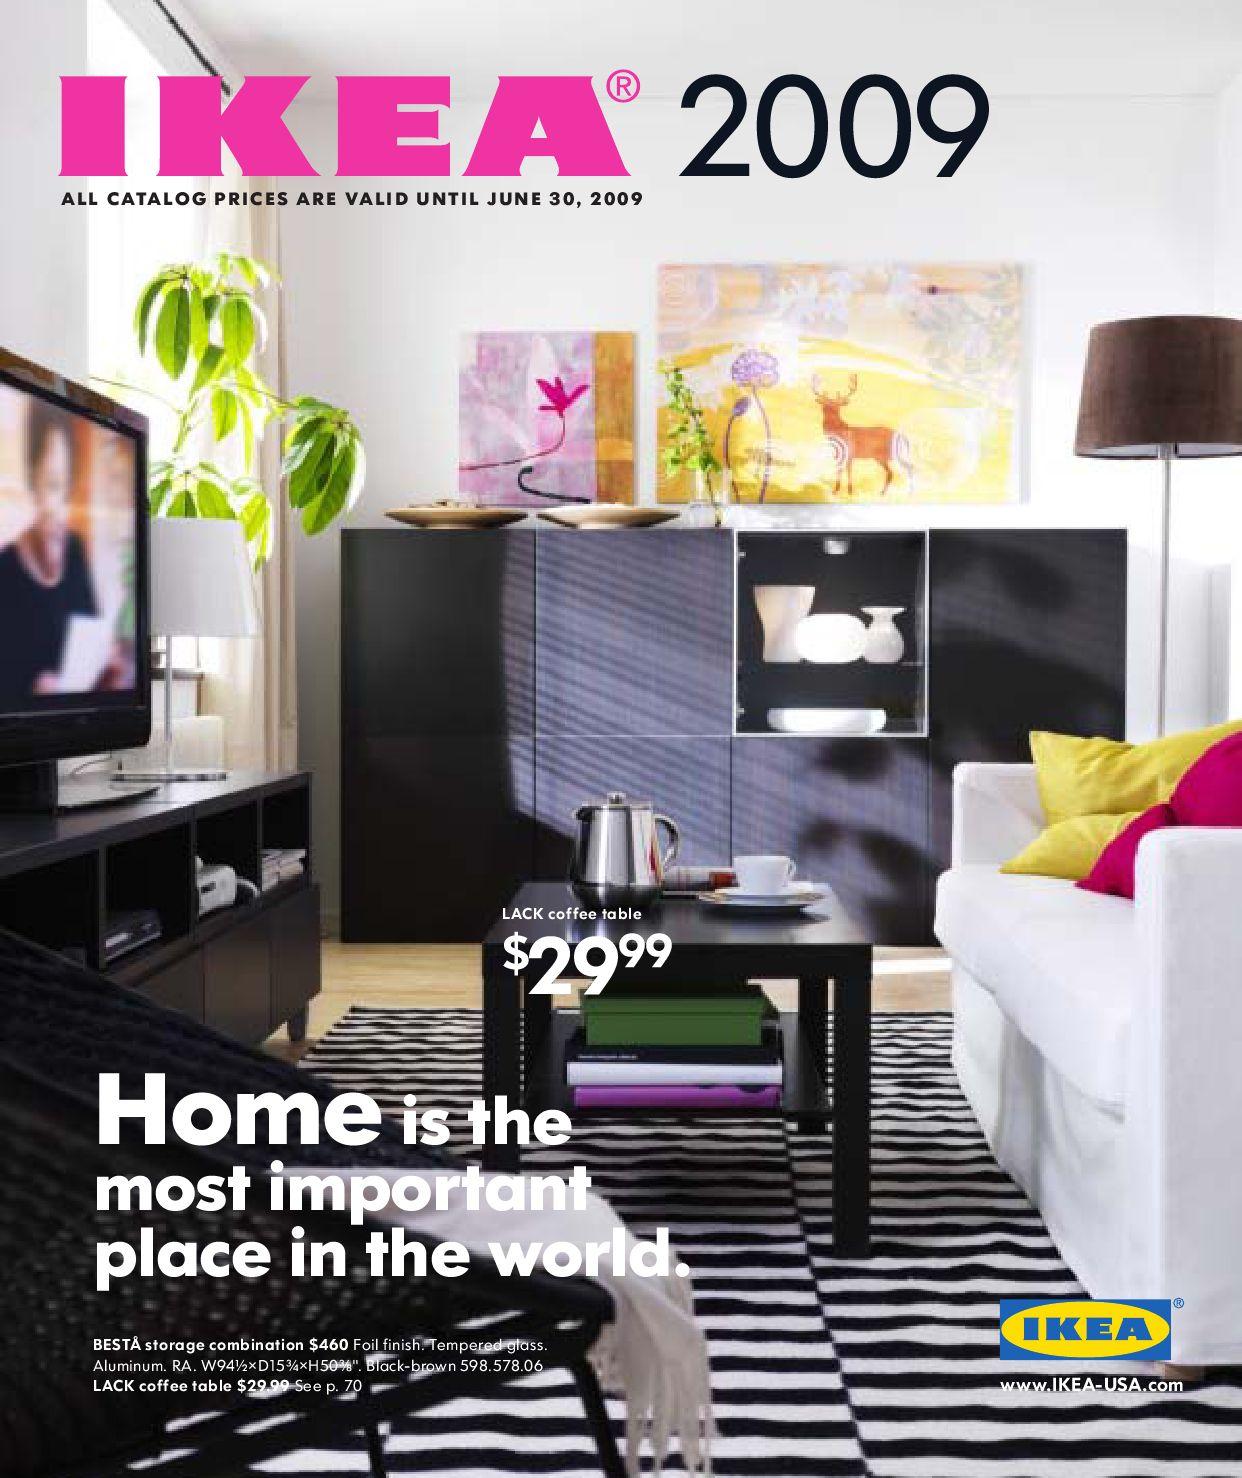 Ikea 2009 Catalogue By Muhammad Mansour Issuu